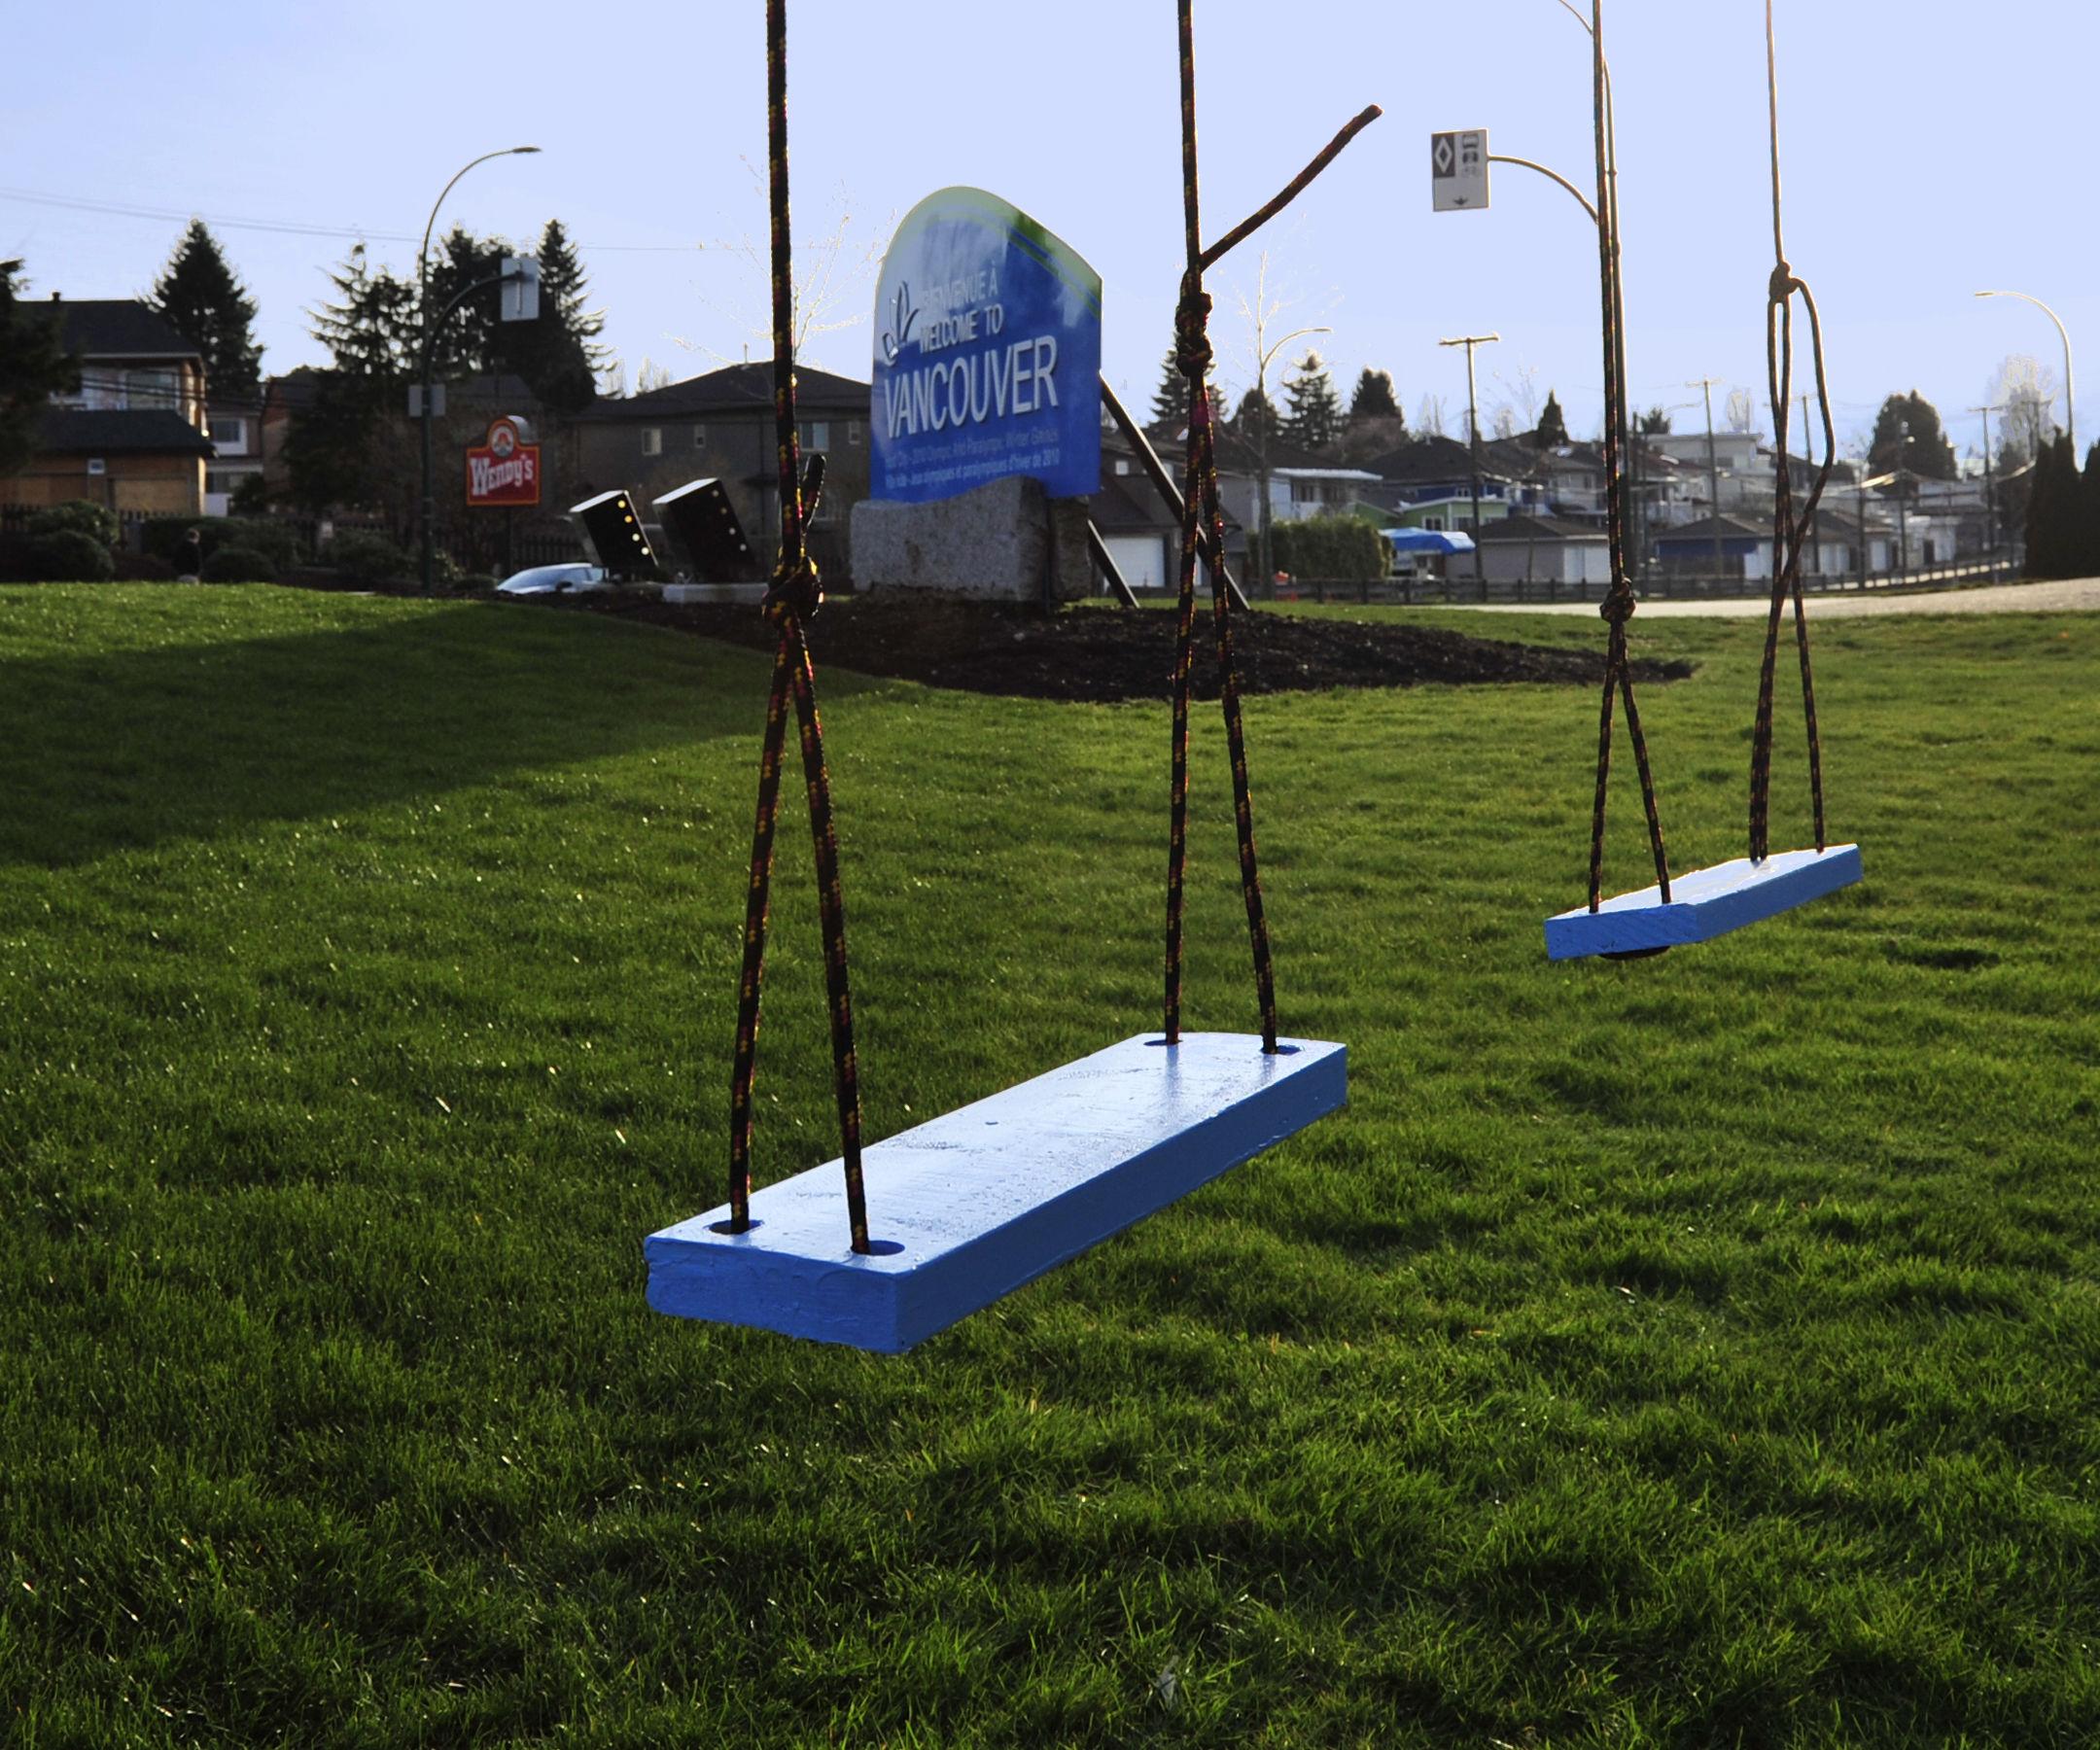 A Swing Set from a Billboard (Using Scrap Lumber)